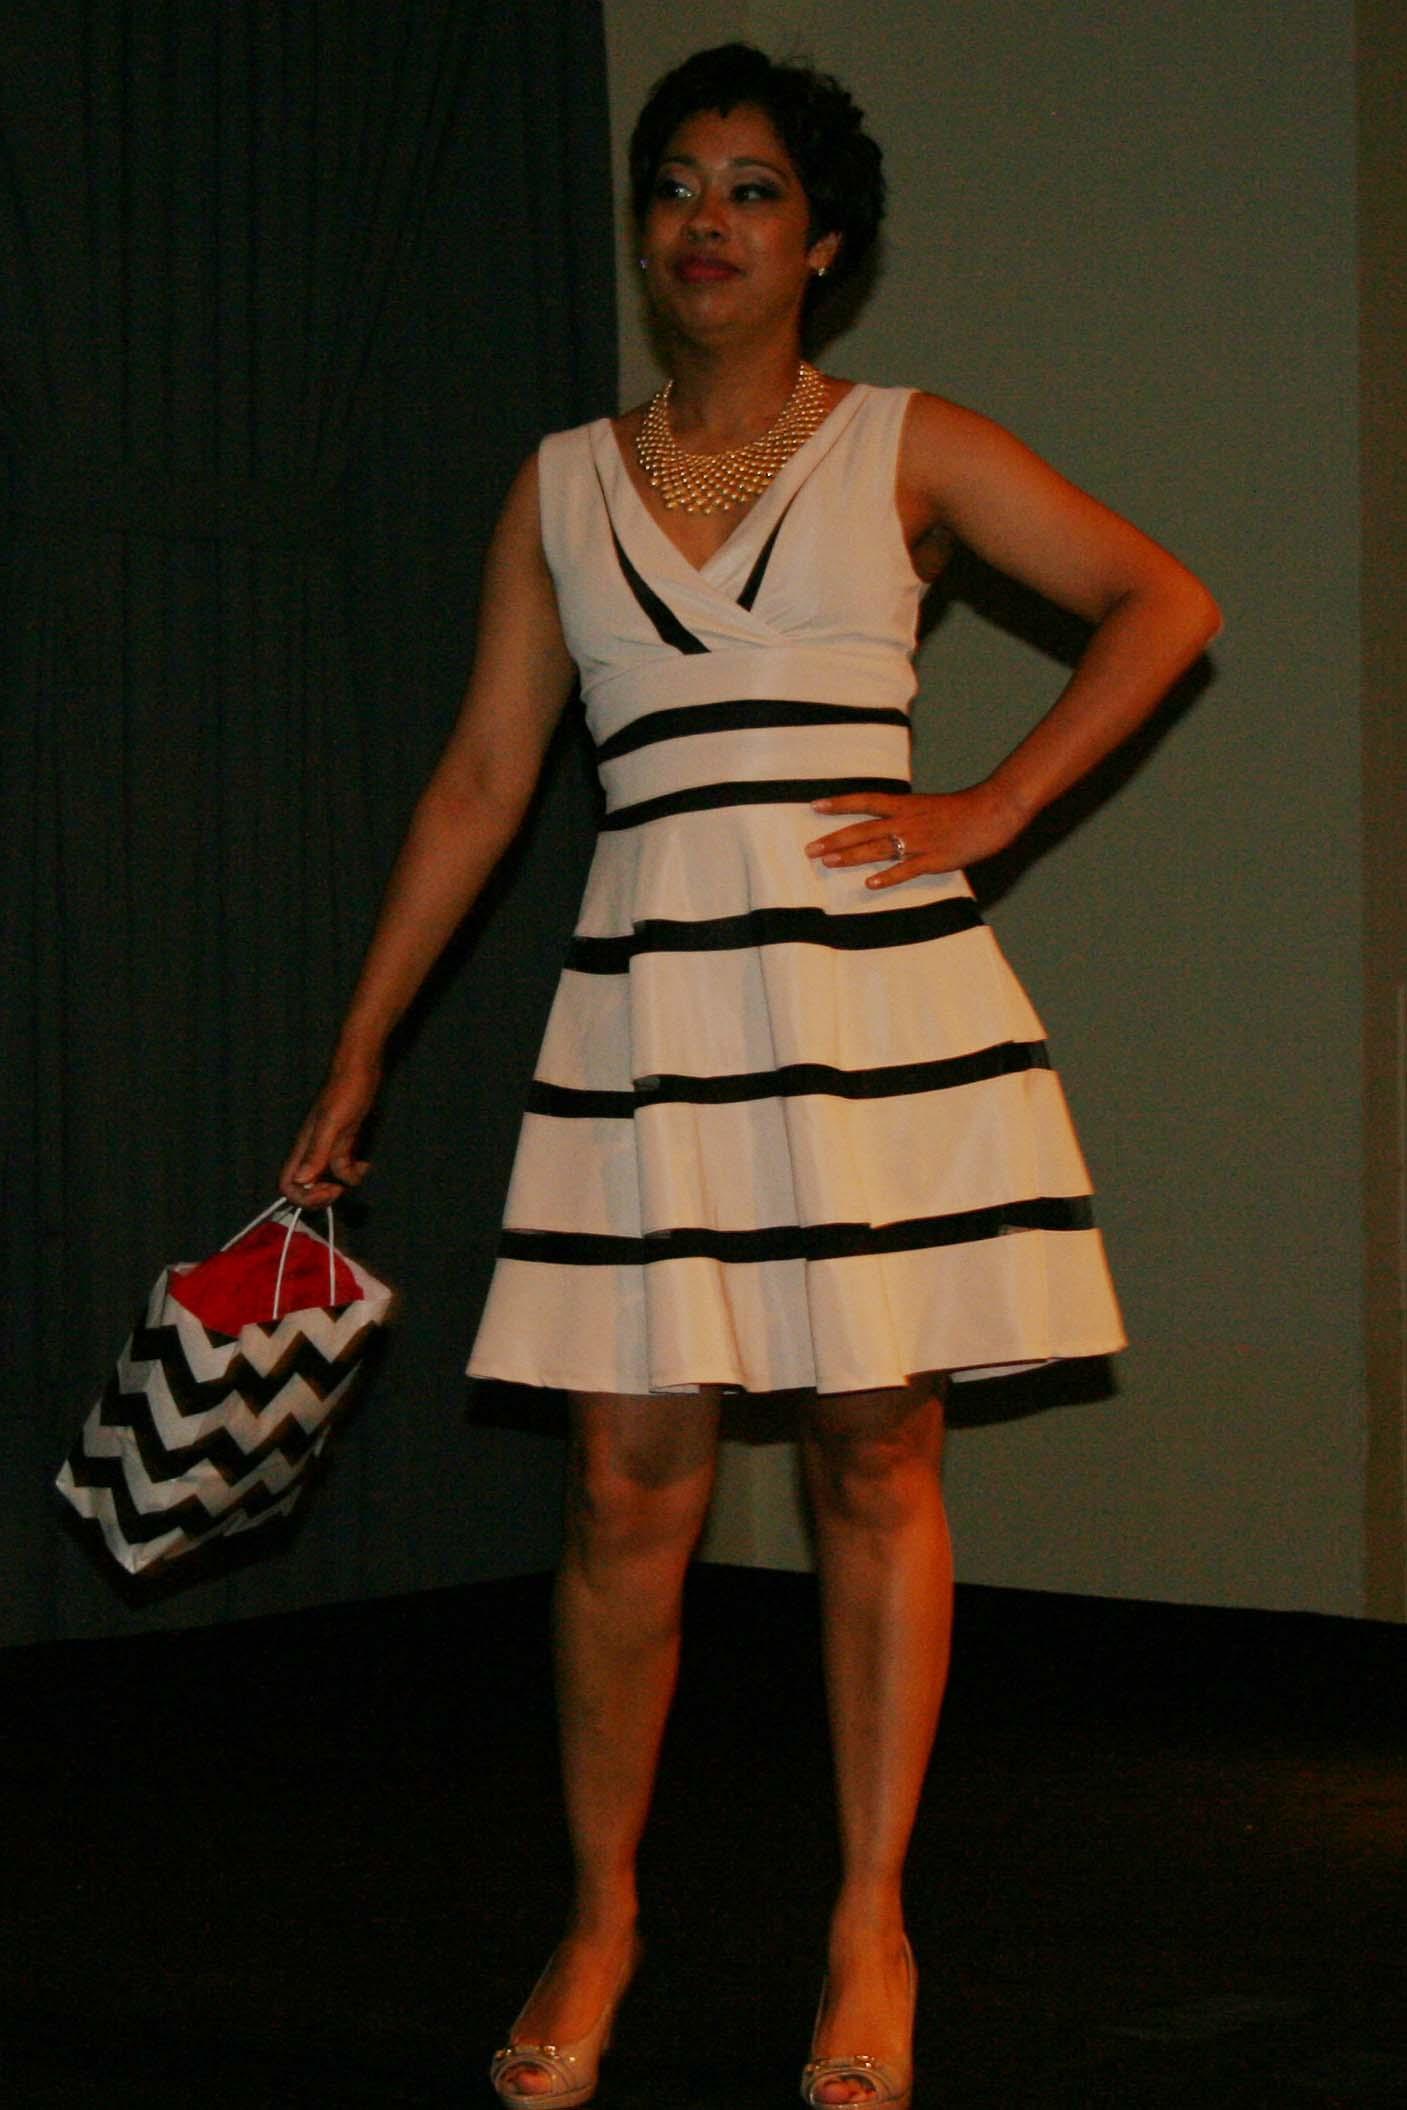 Sonya Gavankar models a black and cream striped dress by maker Ya. (Photo: Mark Heckathorn/DC on Heels)